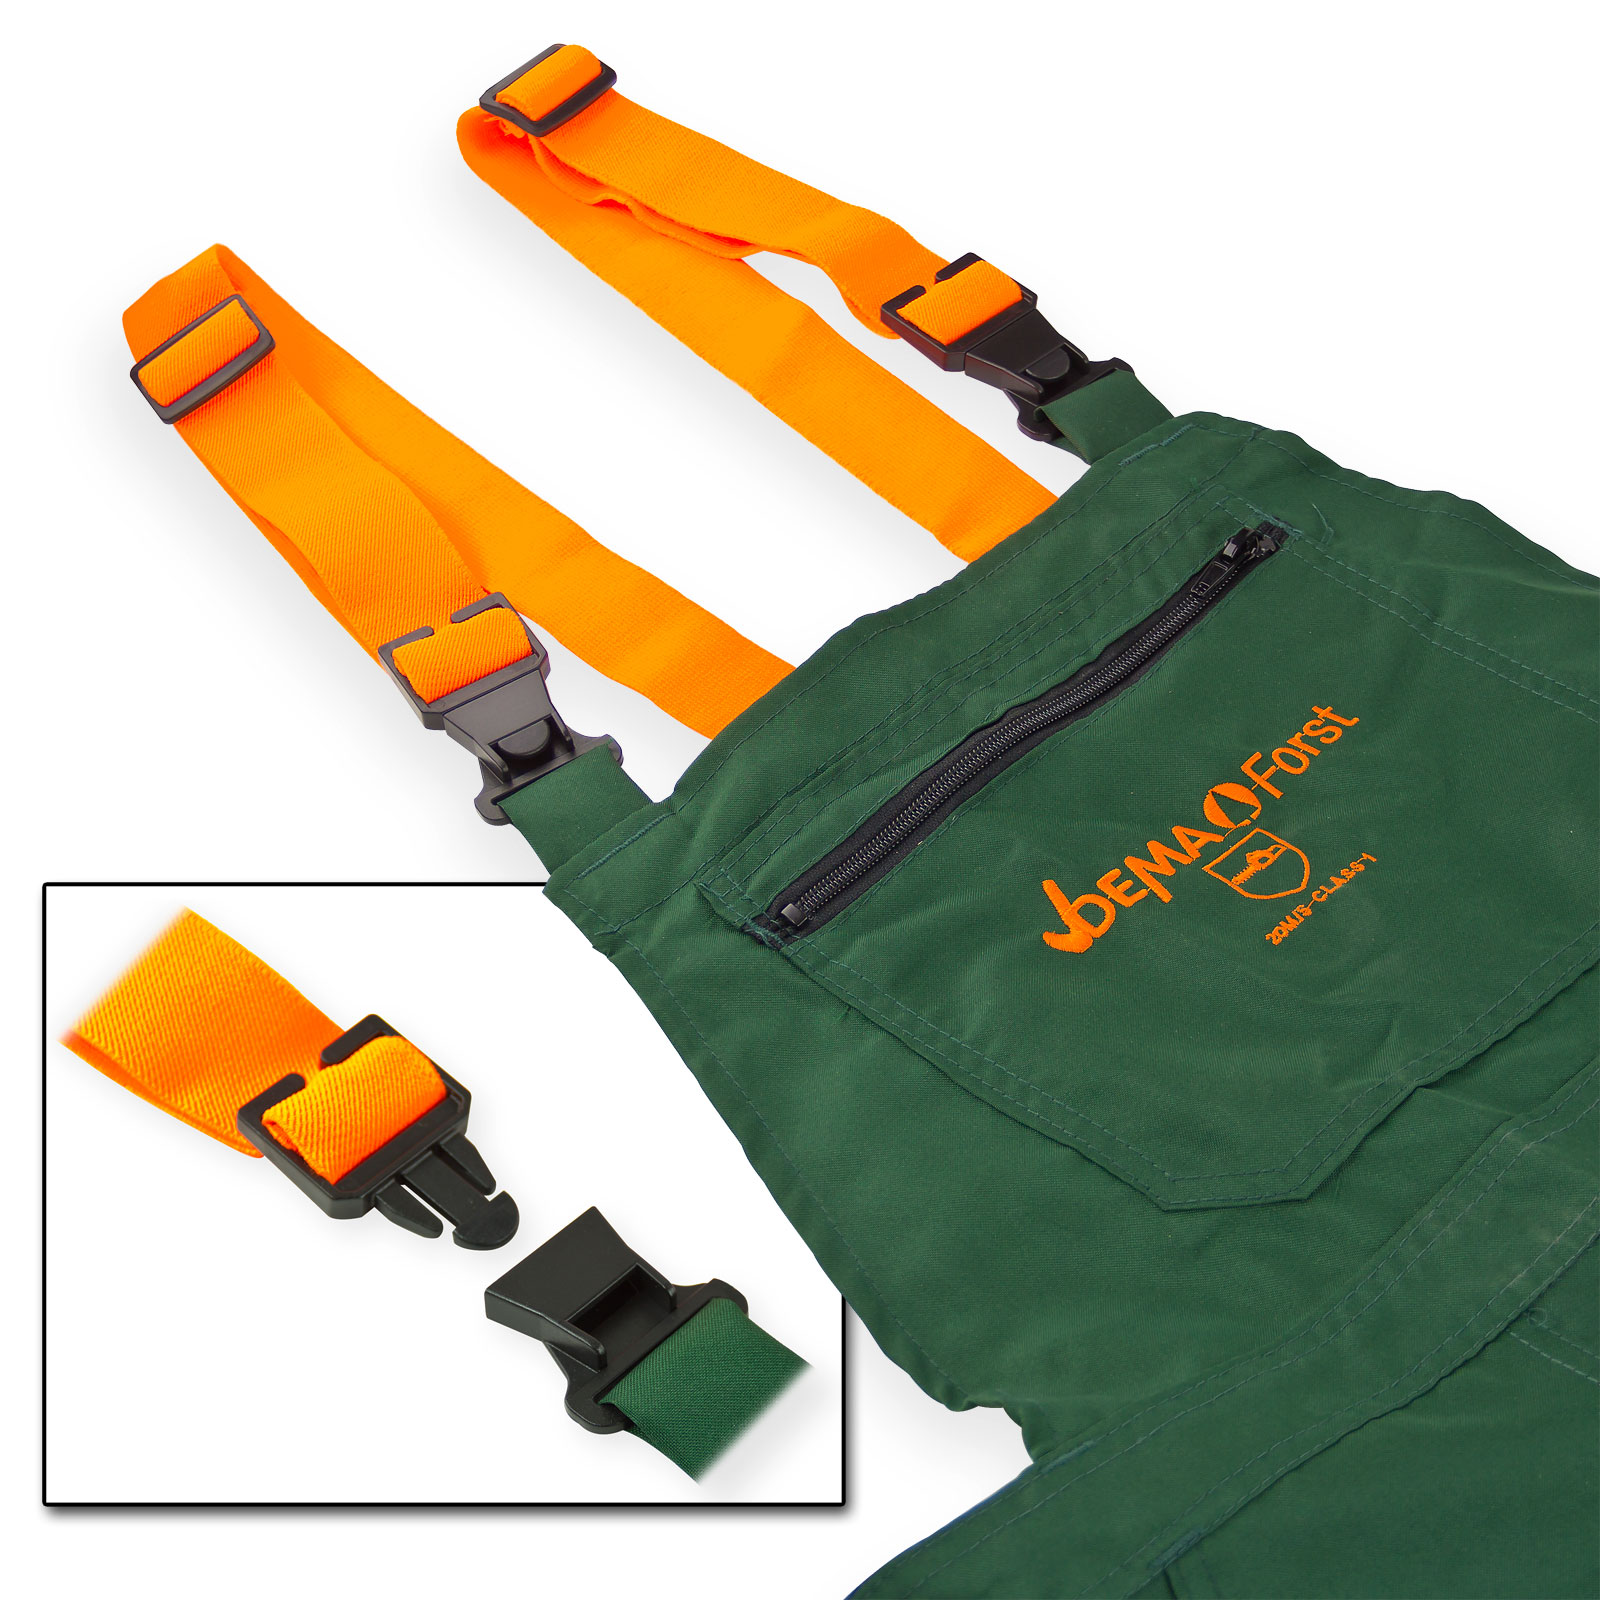 Forst Schnittschutz-Latzhose Eco L grün/warnorange EN 381-5, Schnittschutzlatzhose, Schnitthose, Kettensägenhose, Forsthose, Holzarbeit, 912080, 4031765302388